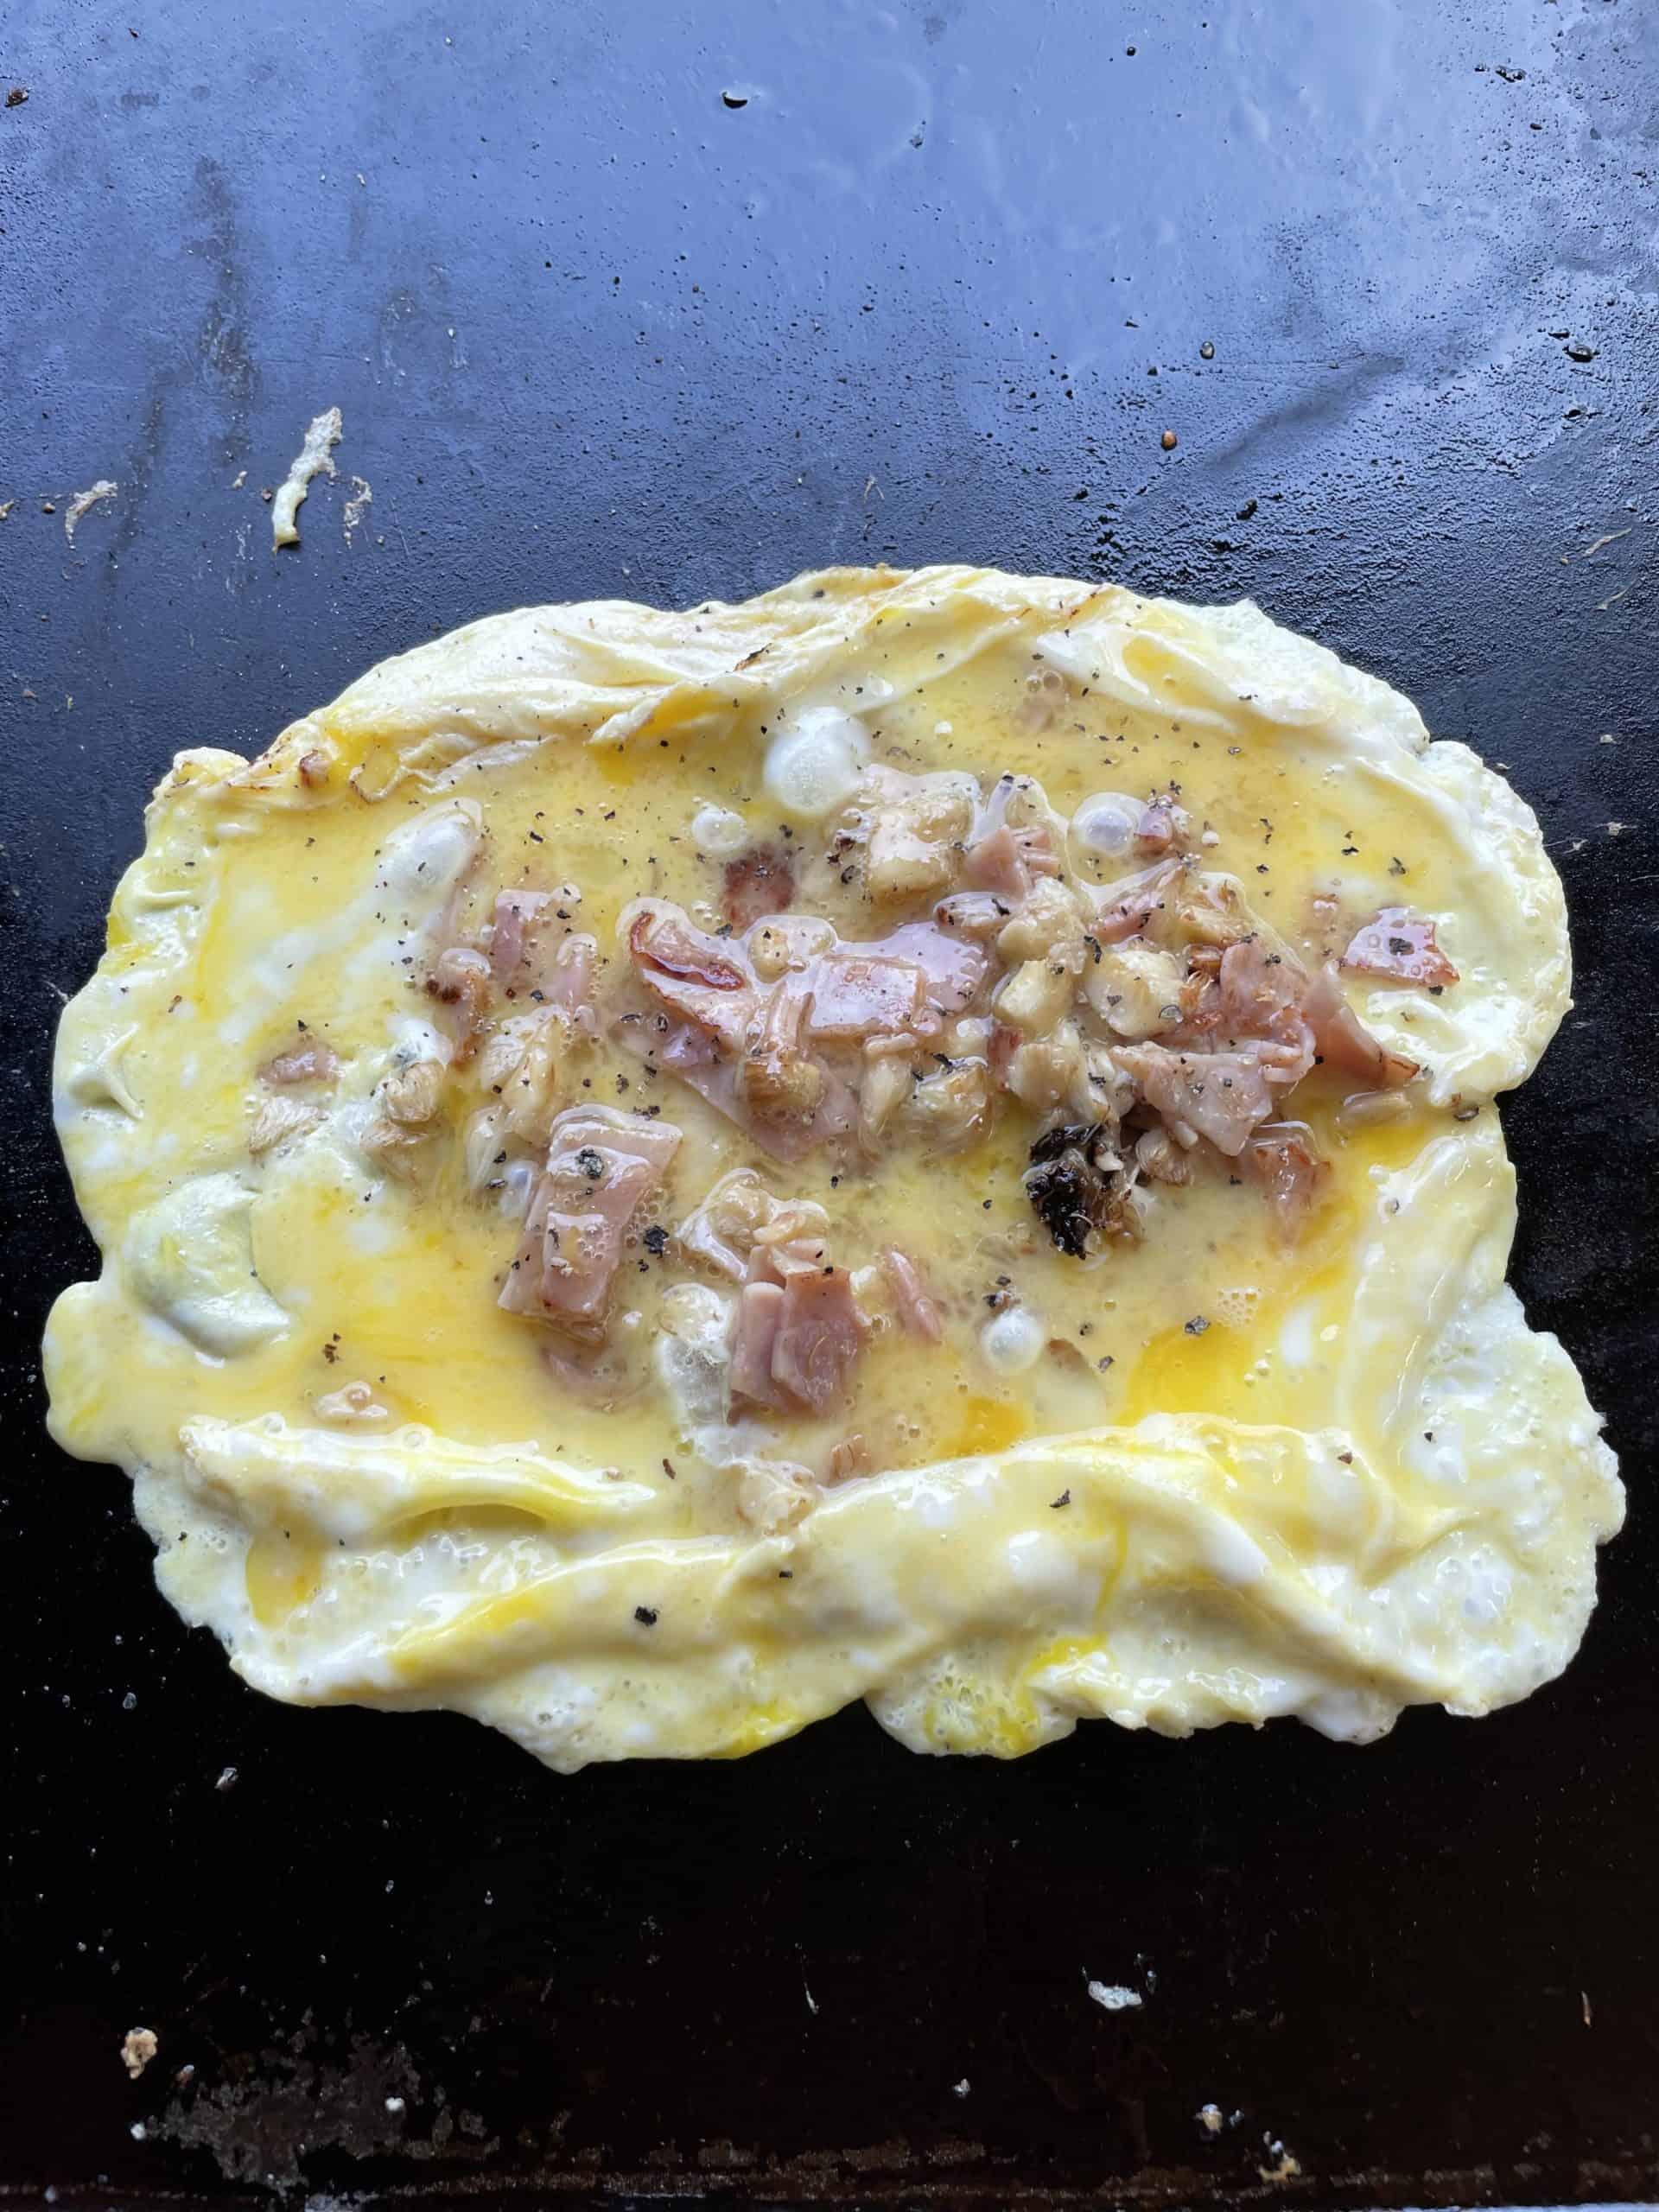 Add Sautéed Ham and Mushroom to Egg Omelette